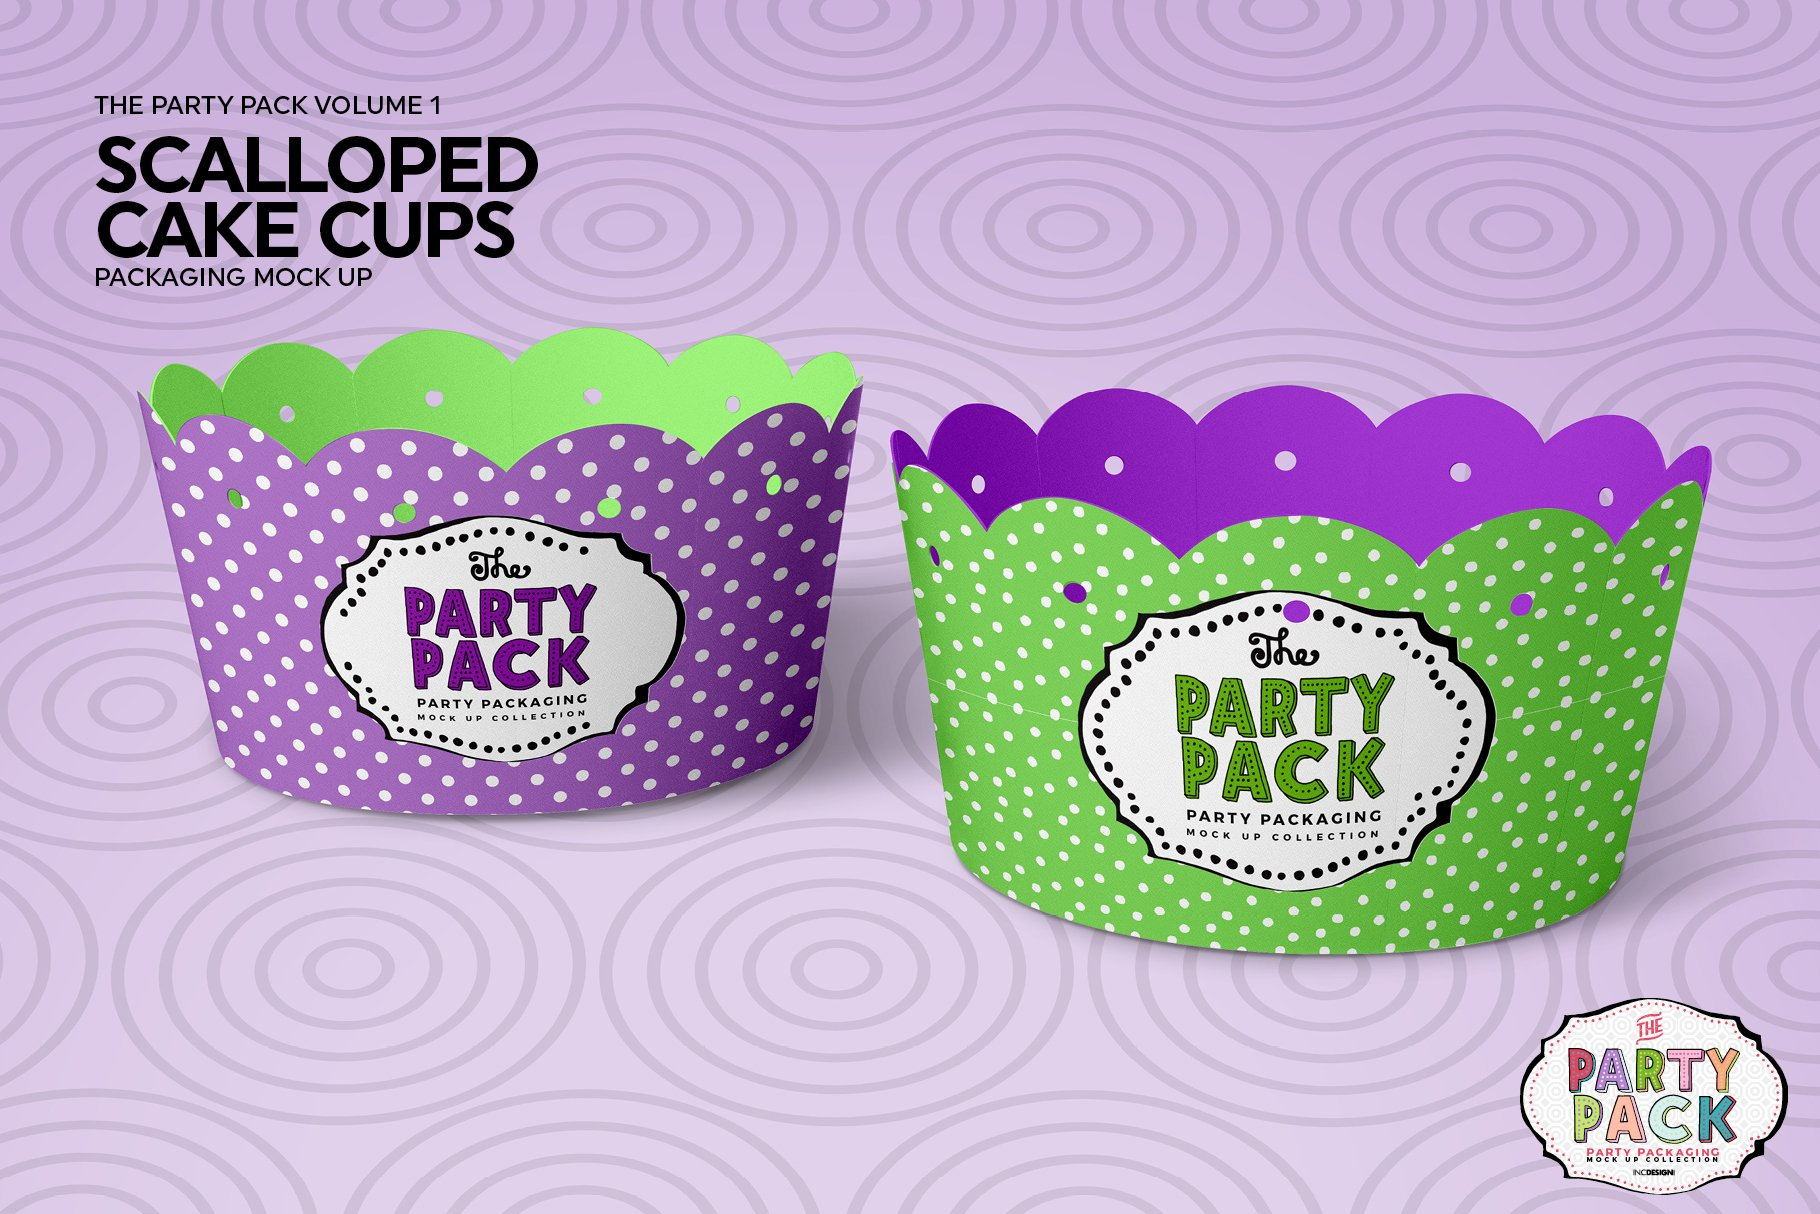 纸杯蛋糕杯包装设计PS贴图样机 Cupcake Cups Packaging Mockup插图4